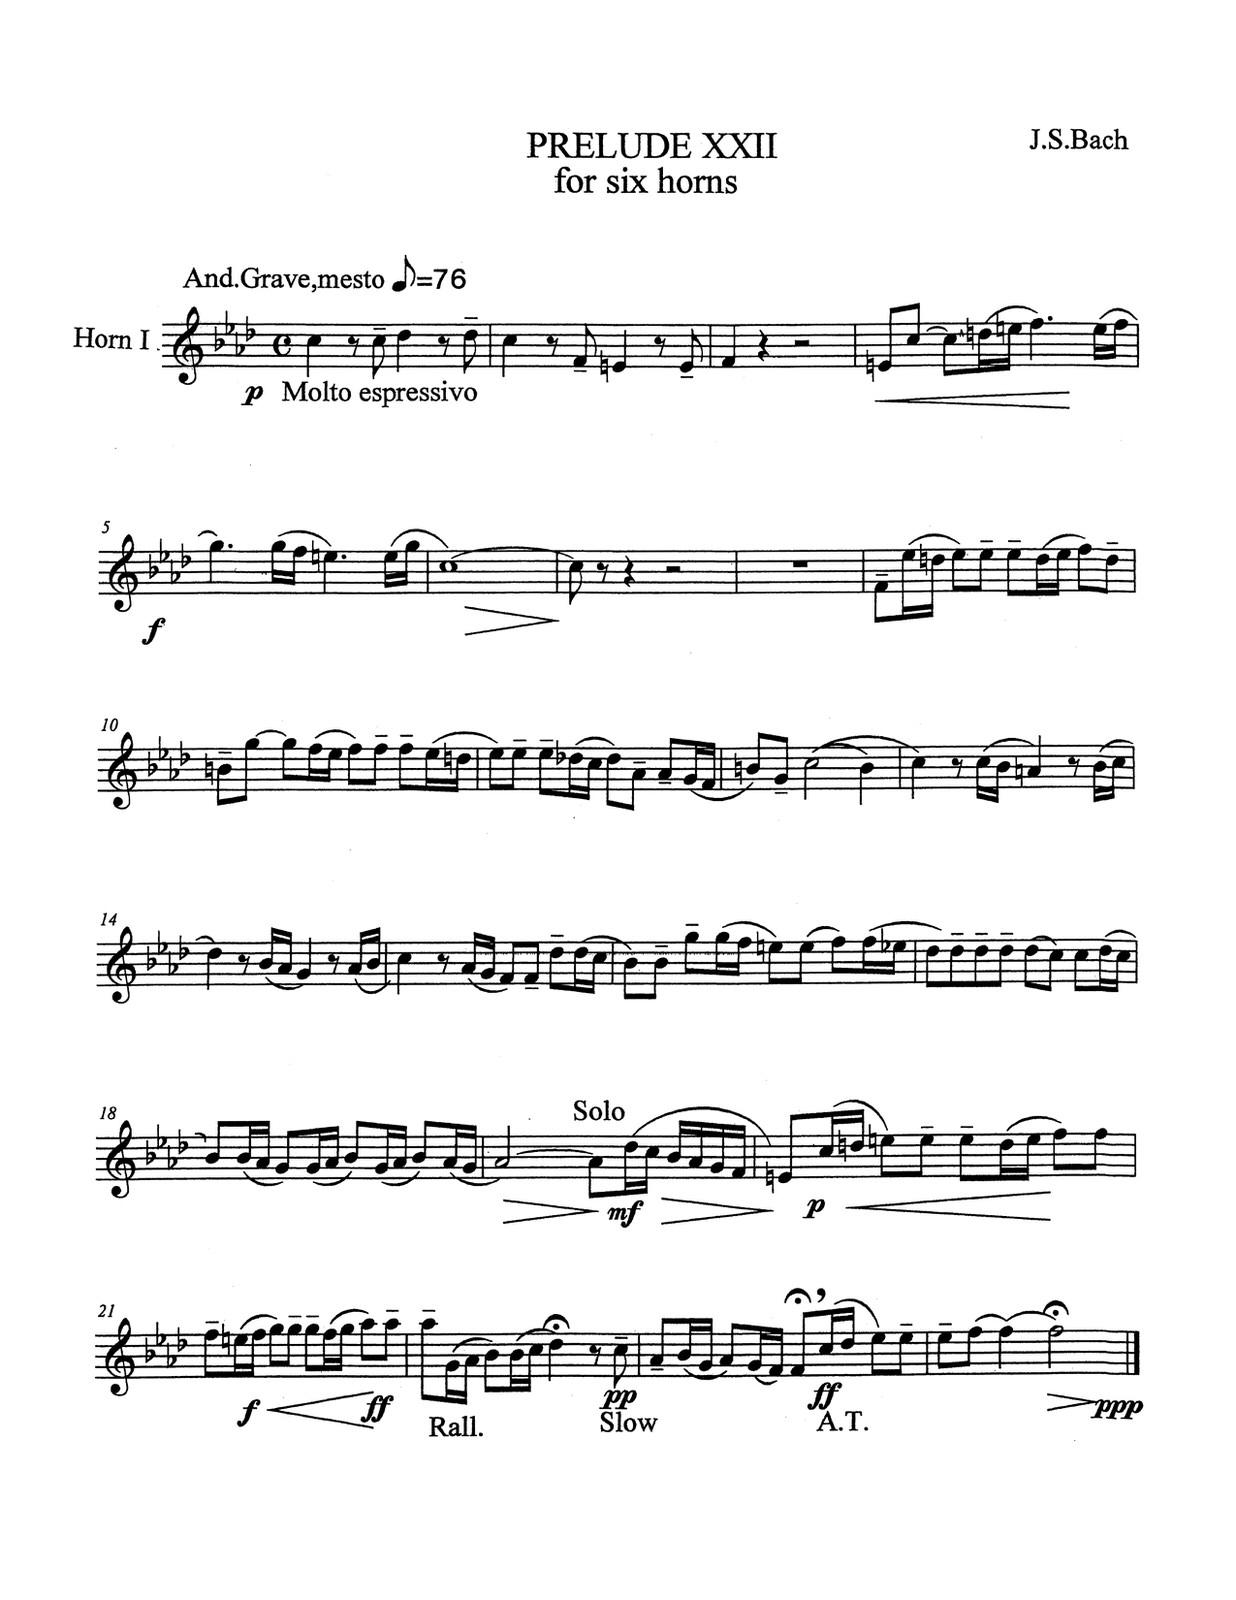 Barranco-Bach, Prelude & Fuge XXII for 6 Horns-p17